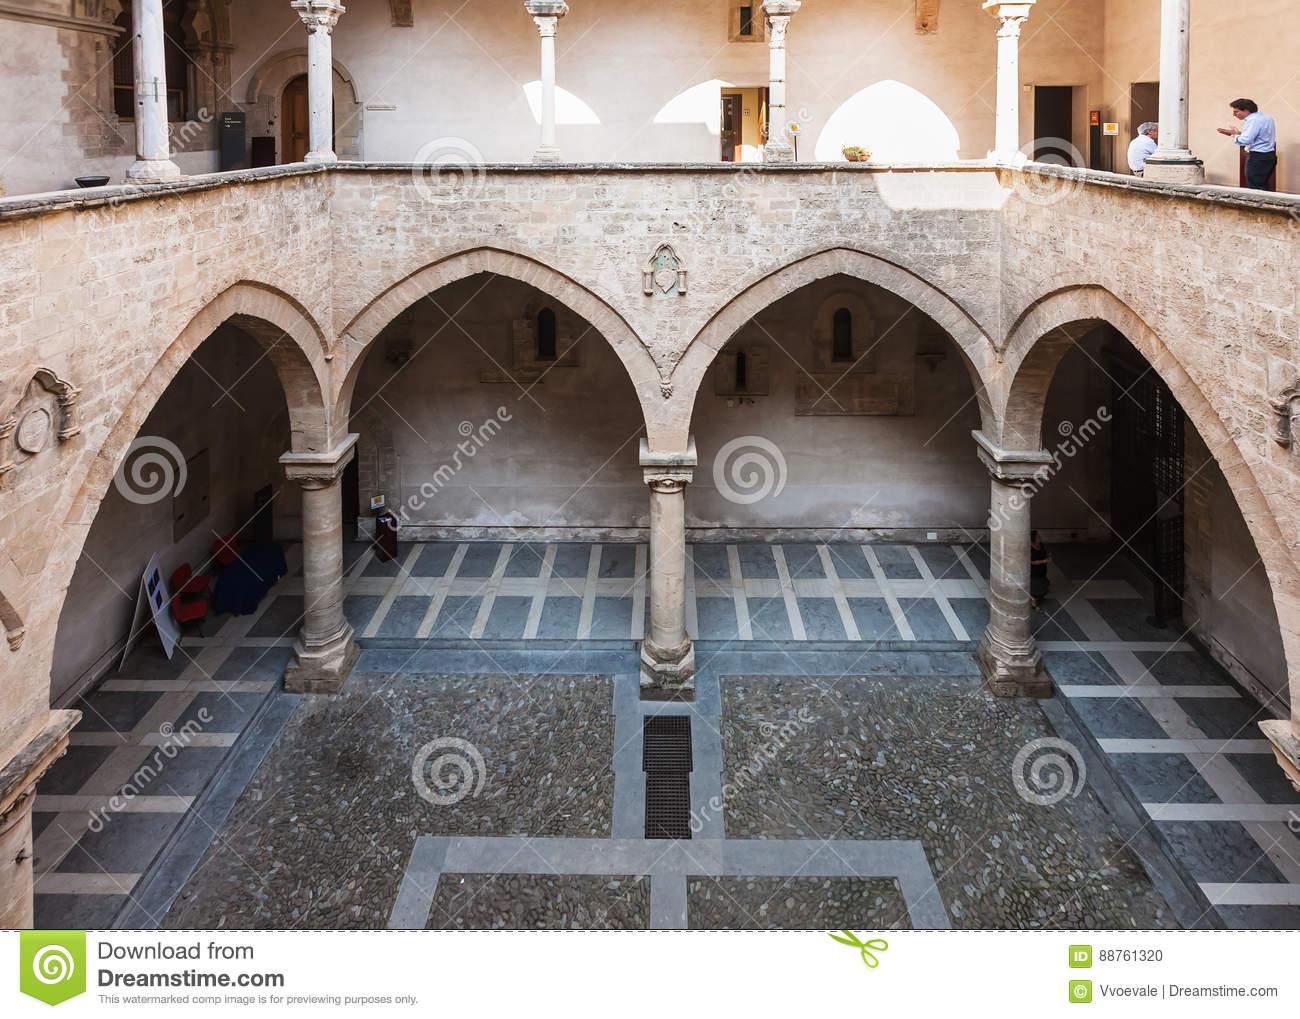 patio-palazzo-chiaramonte-steri-palermo-italy-june-building-was-begun-early-th-century-was-88761320